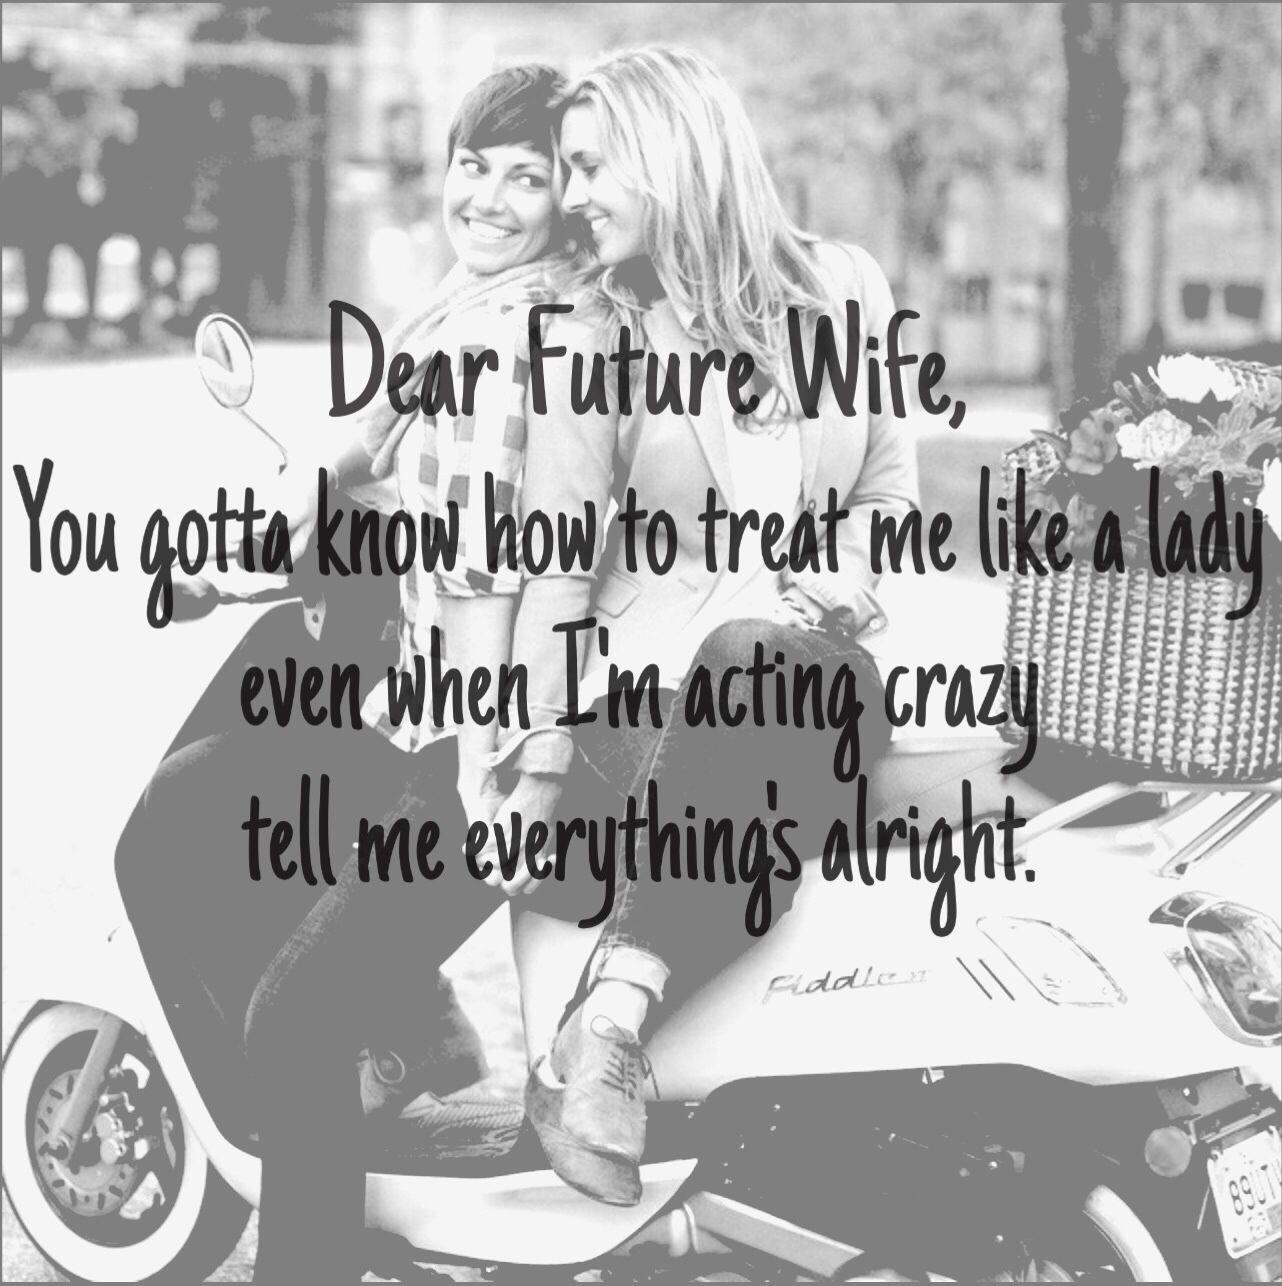 Lesbian Love Quotes Images Dear Future Wife Lesbian Romance Love  Future  Pinterest